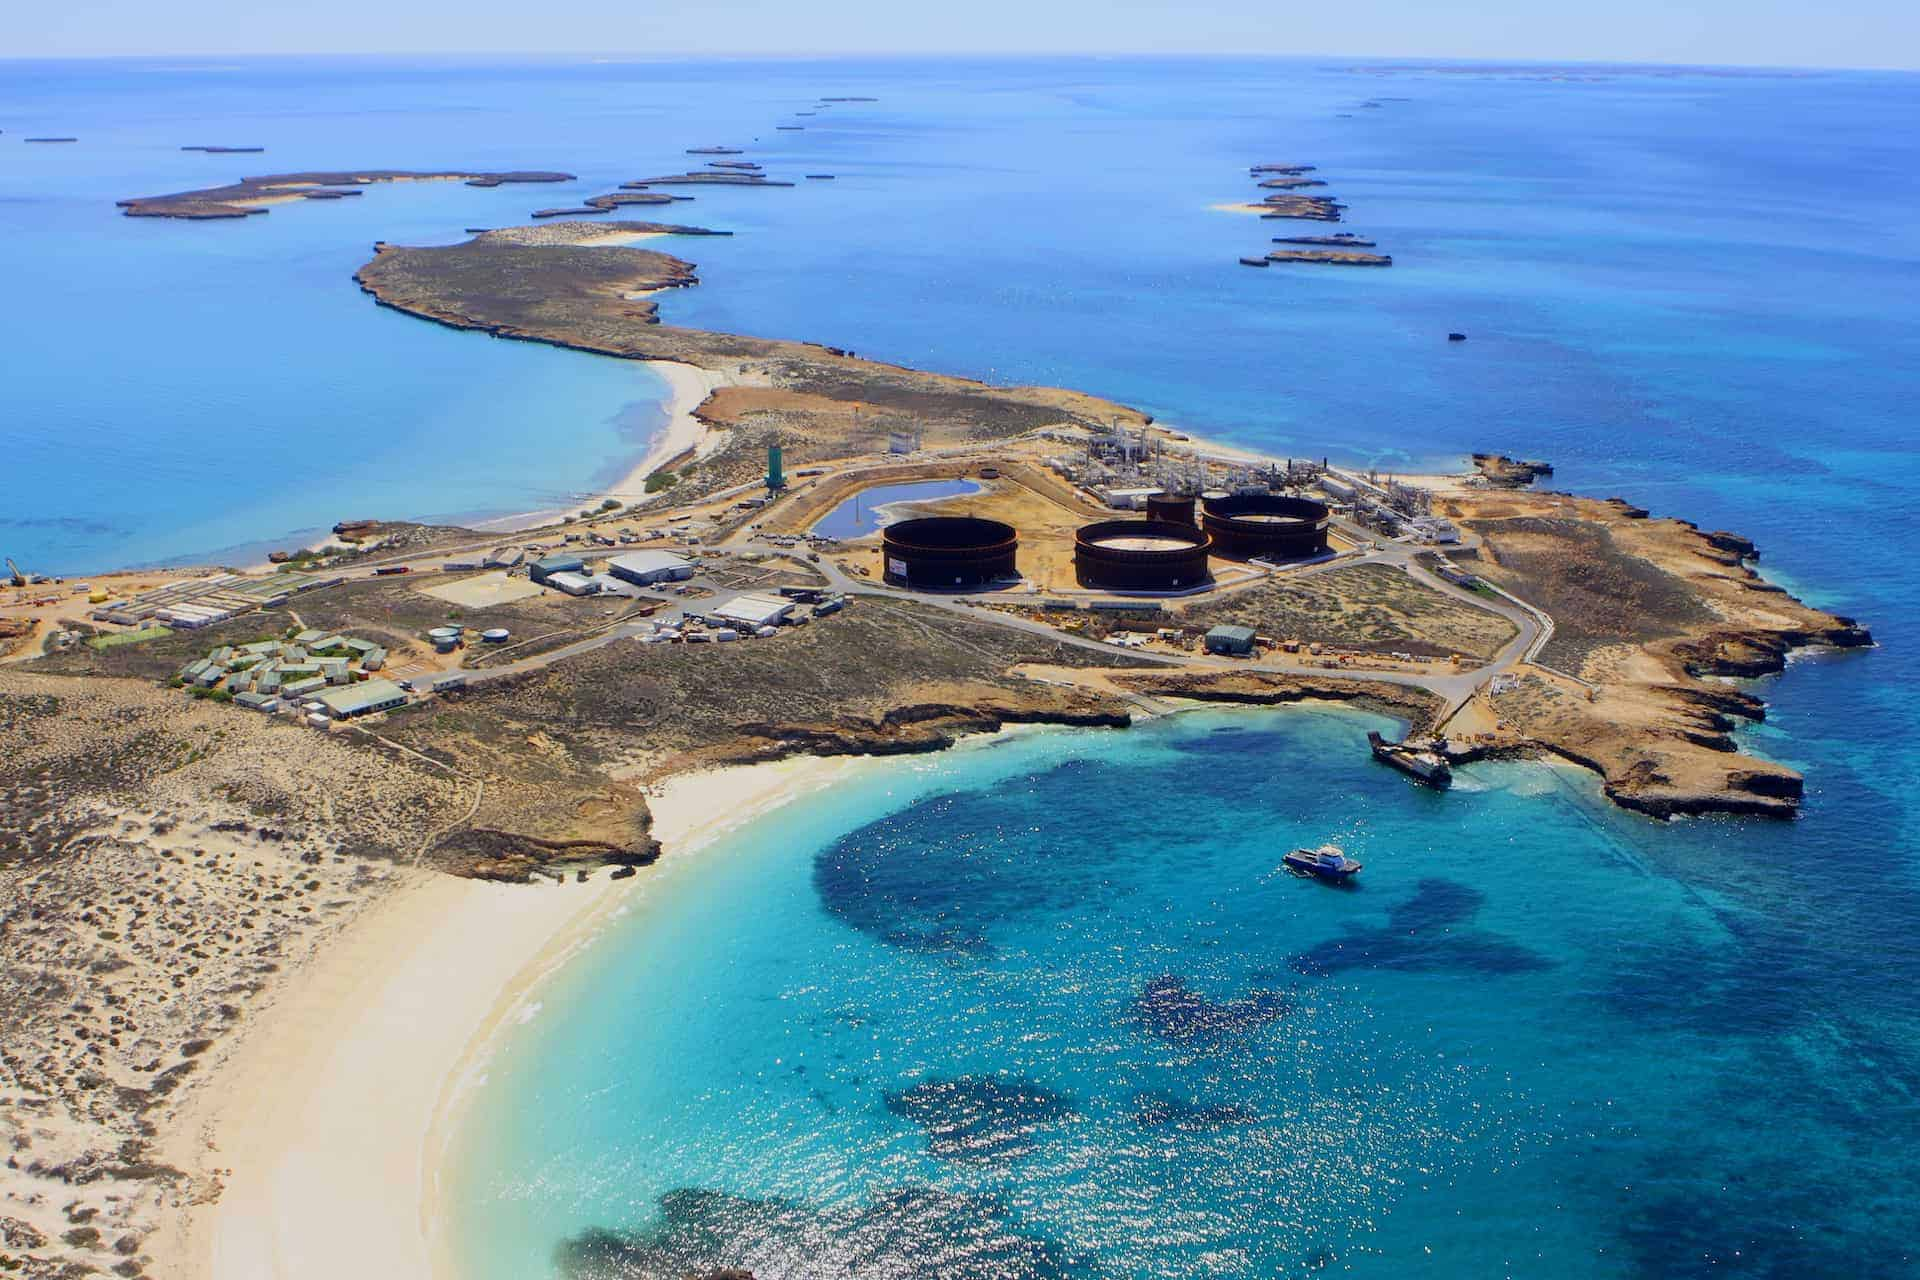 Santos' Varanus Island - now WA's biggest gas supplier